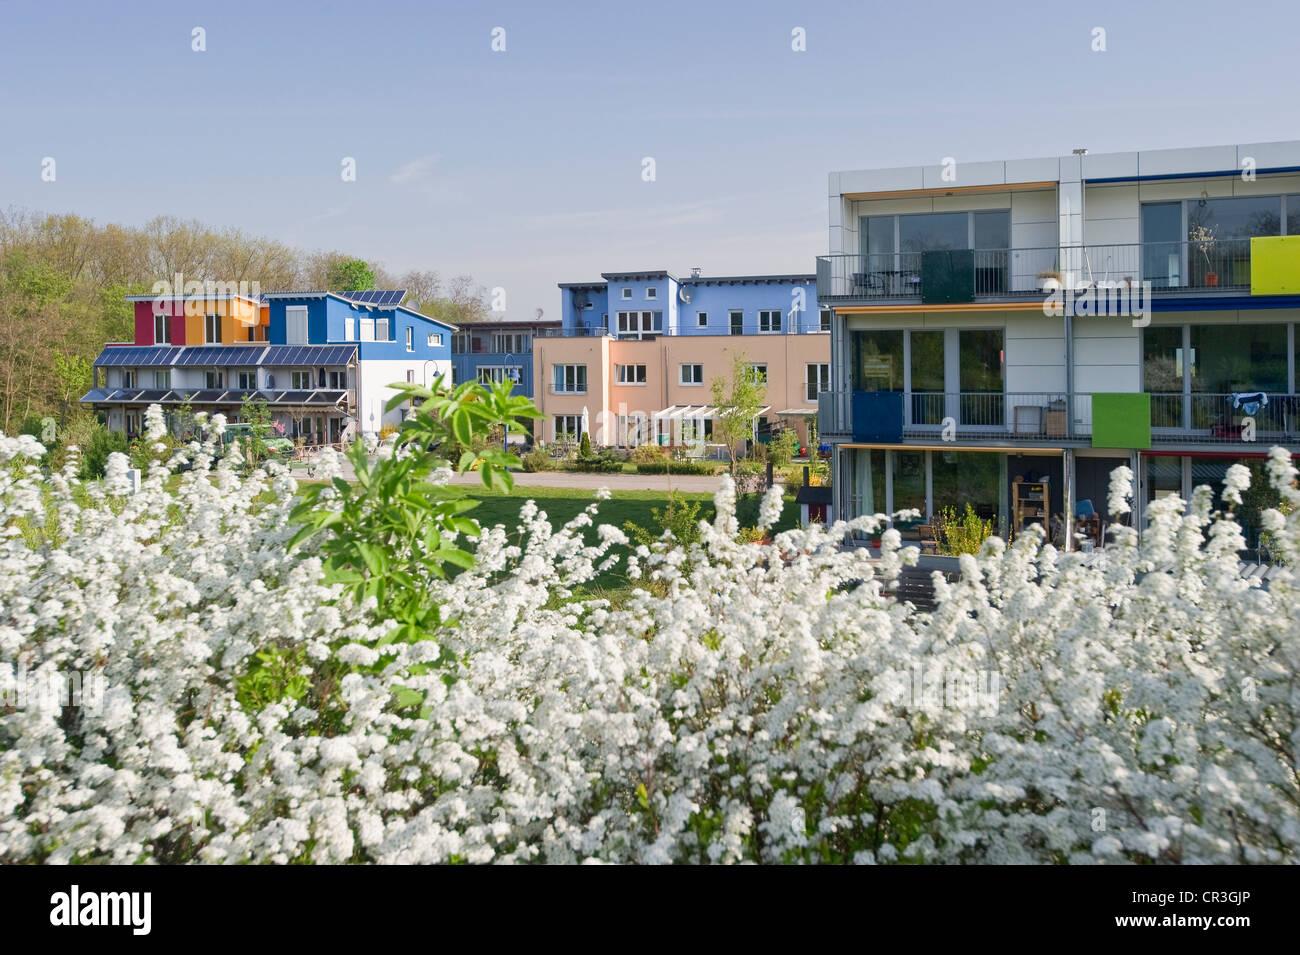 Maisons passives, quartier Rieselfeld, Freiburg im Breisgau, Bade-Wurtemberg, Allemagne, Europe Photo Stock